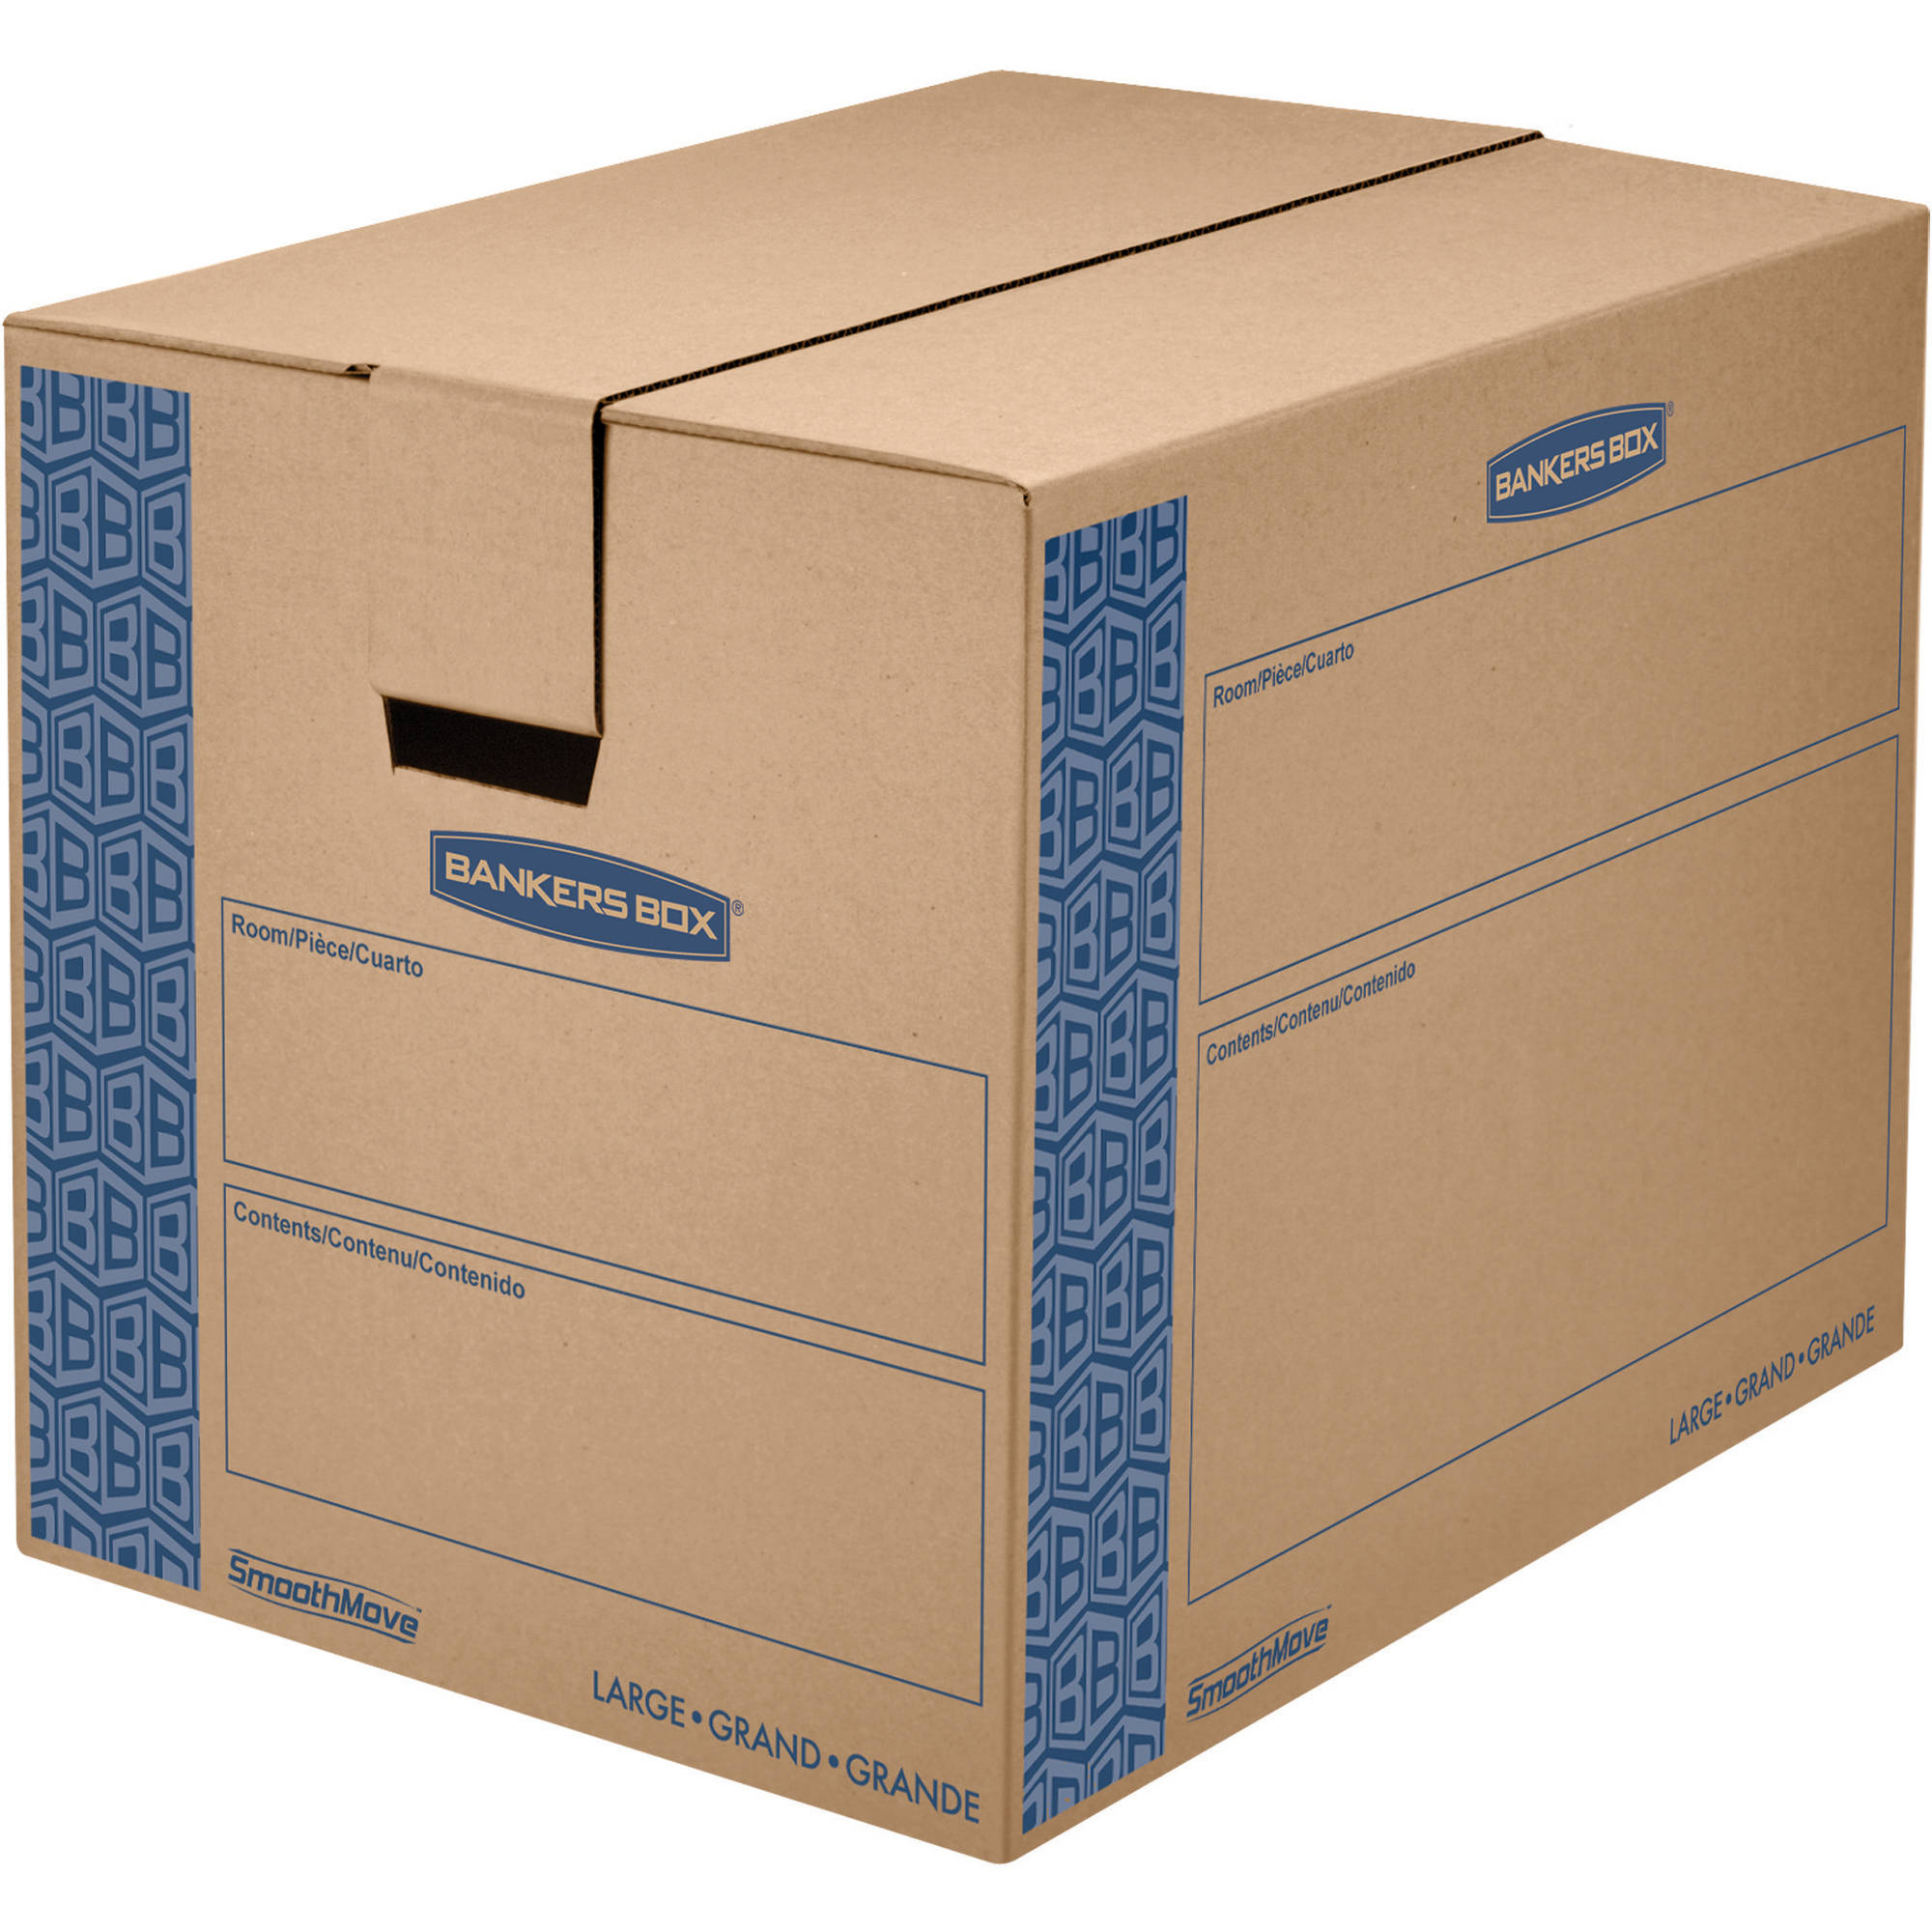 Bankers Box SmoothMove Prime Moving Box, Large, 6pk